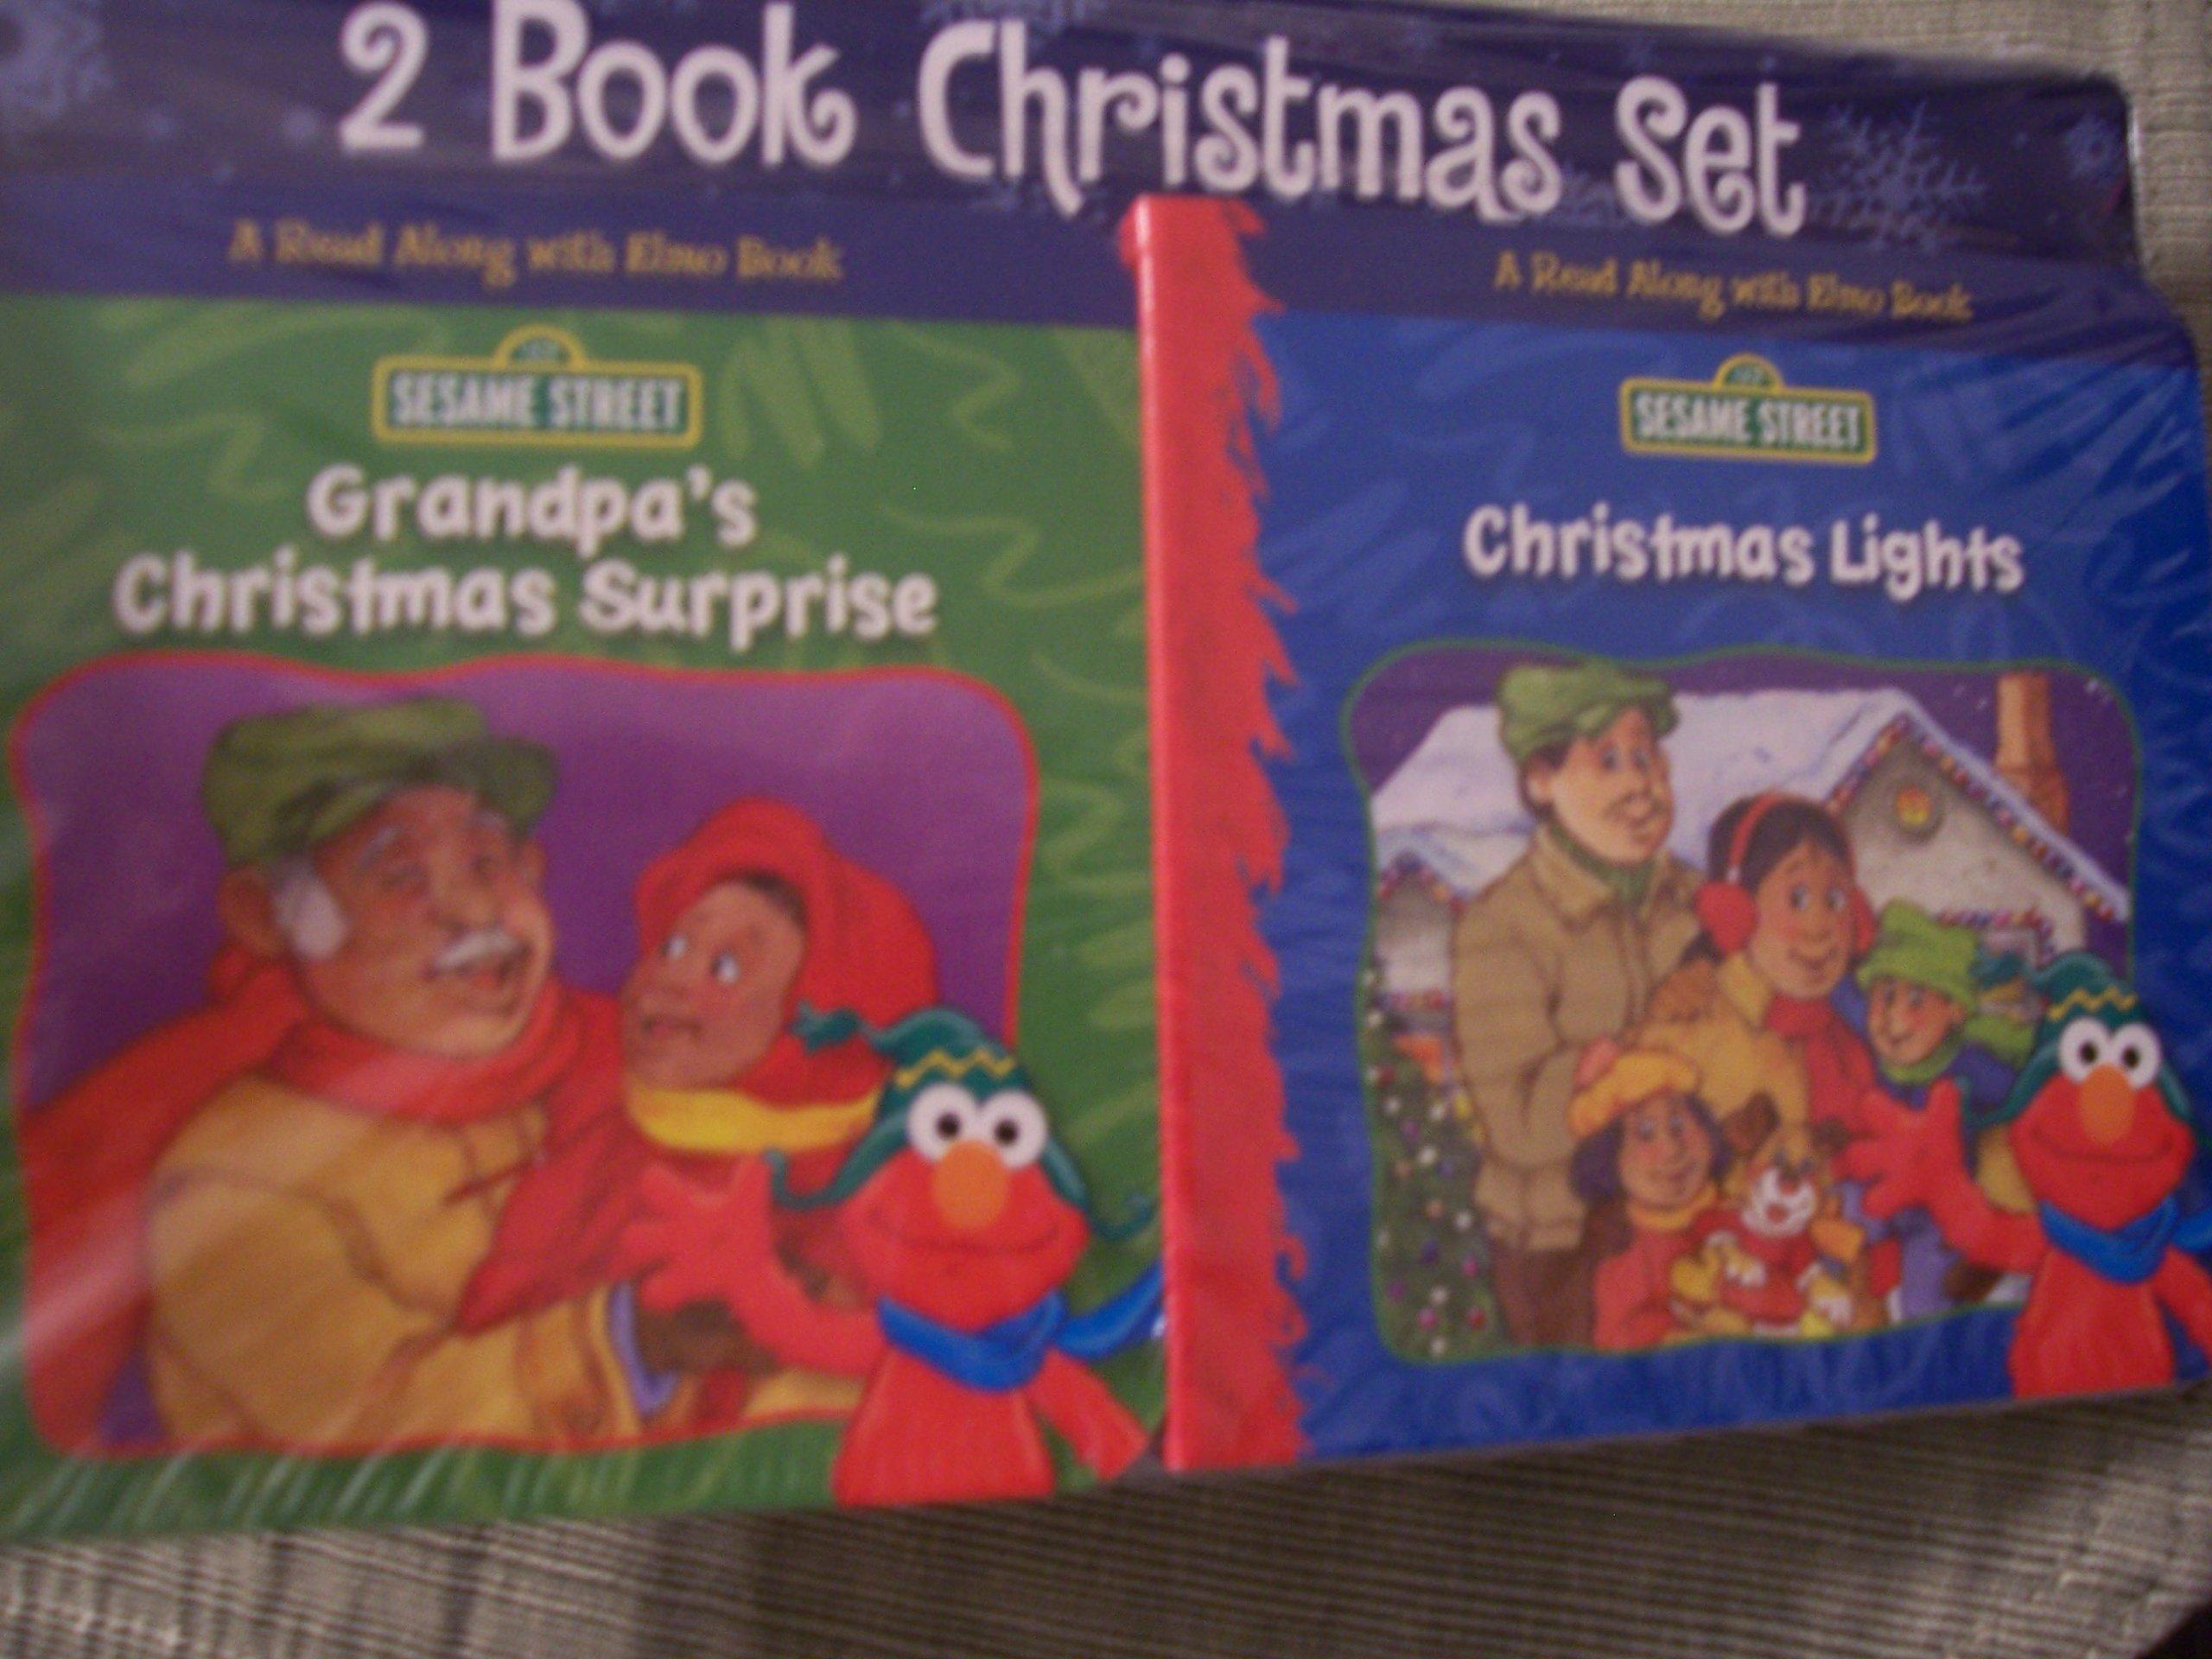 Sesame Street 2 Christmas Book Set ~ Grandpa's Christmas Surprise & Christmas Lights (A Read Along with Elmo Book) ebook